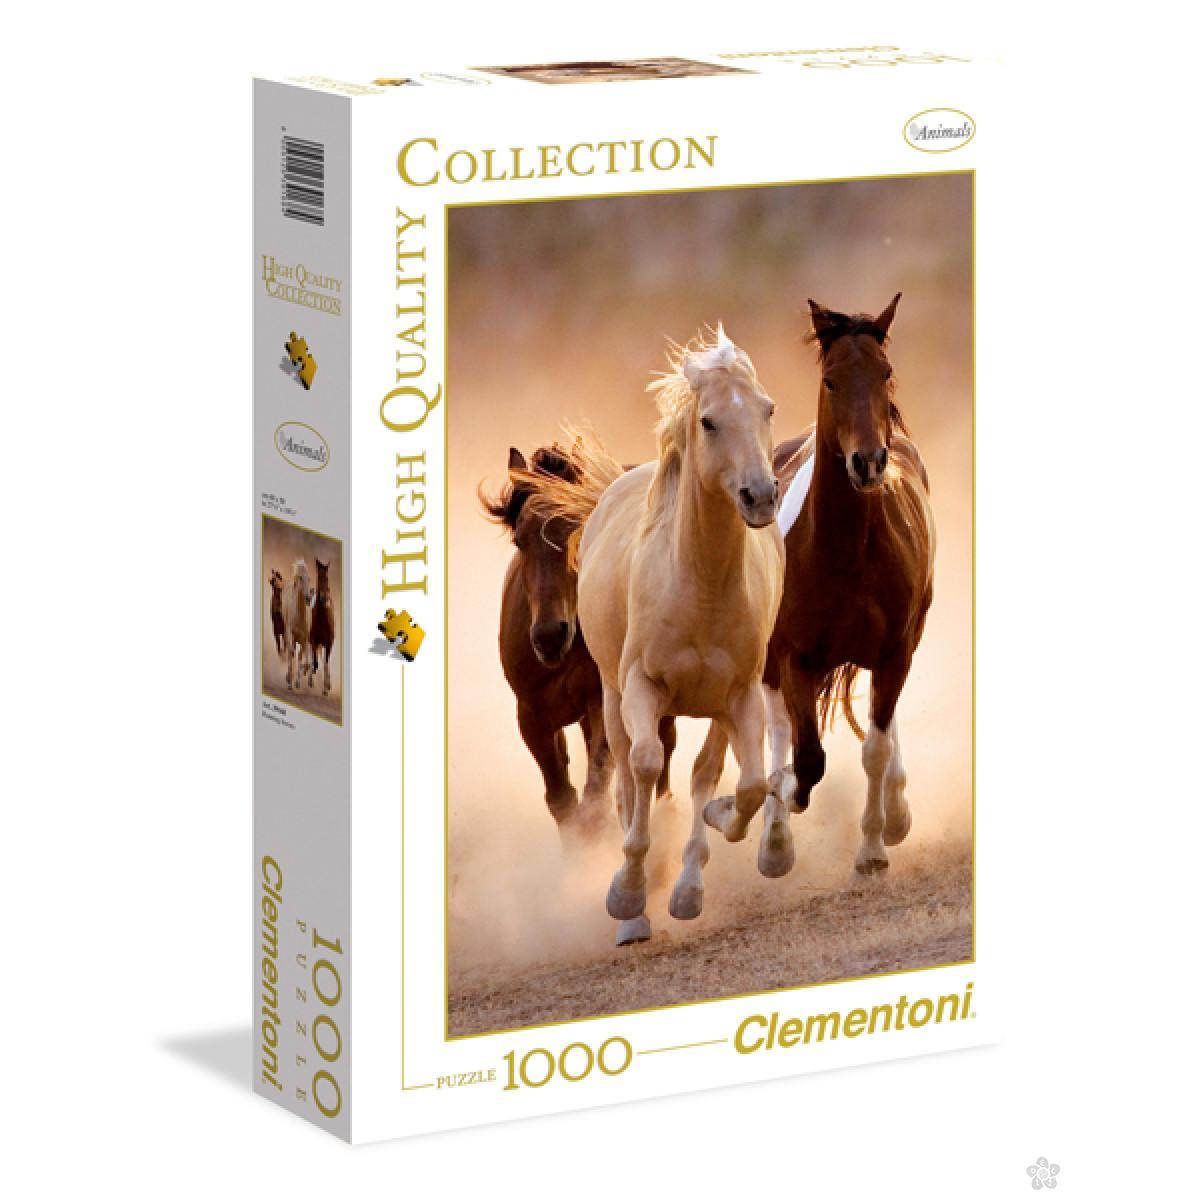 Clementoni puzzla Running Horses 1000pcs 39168